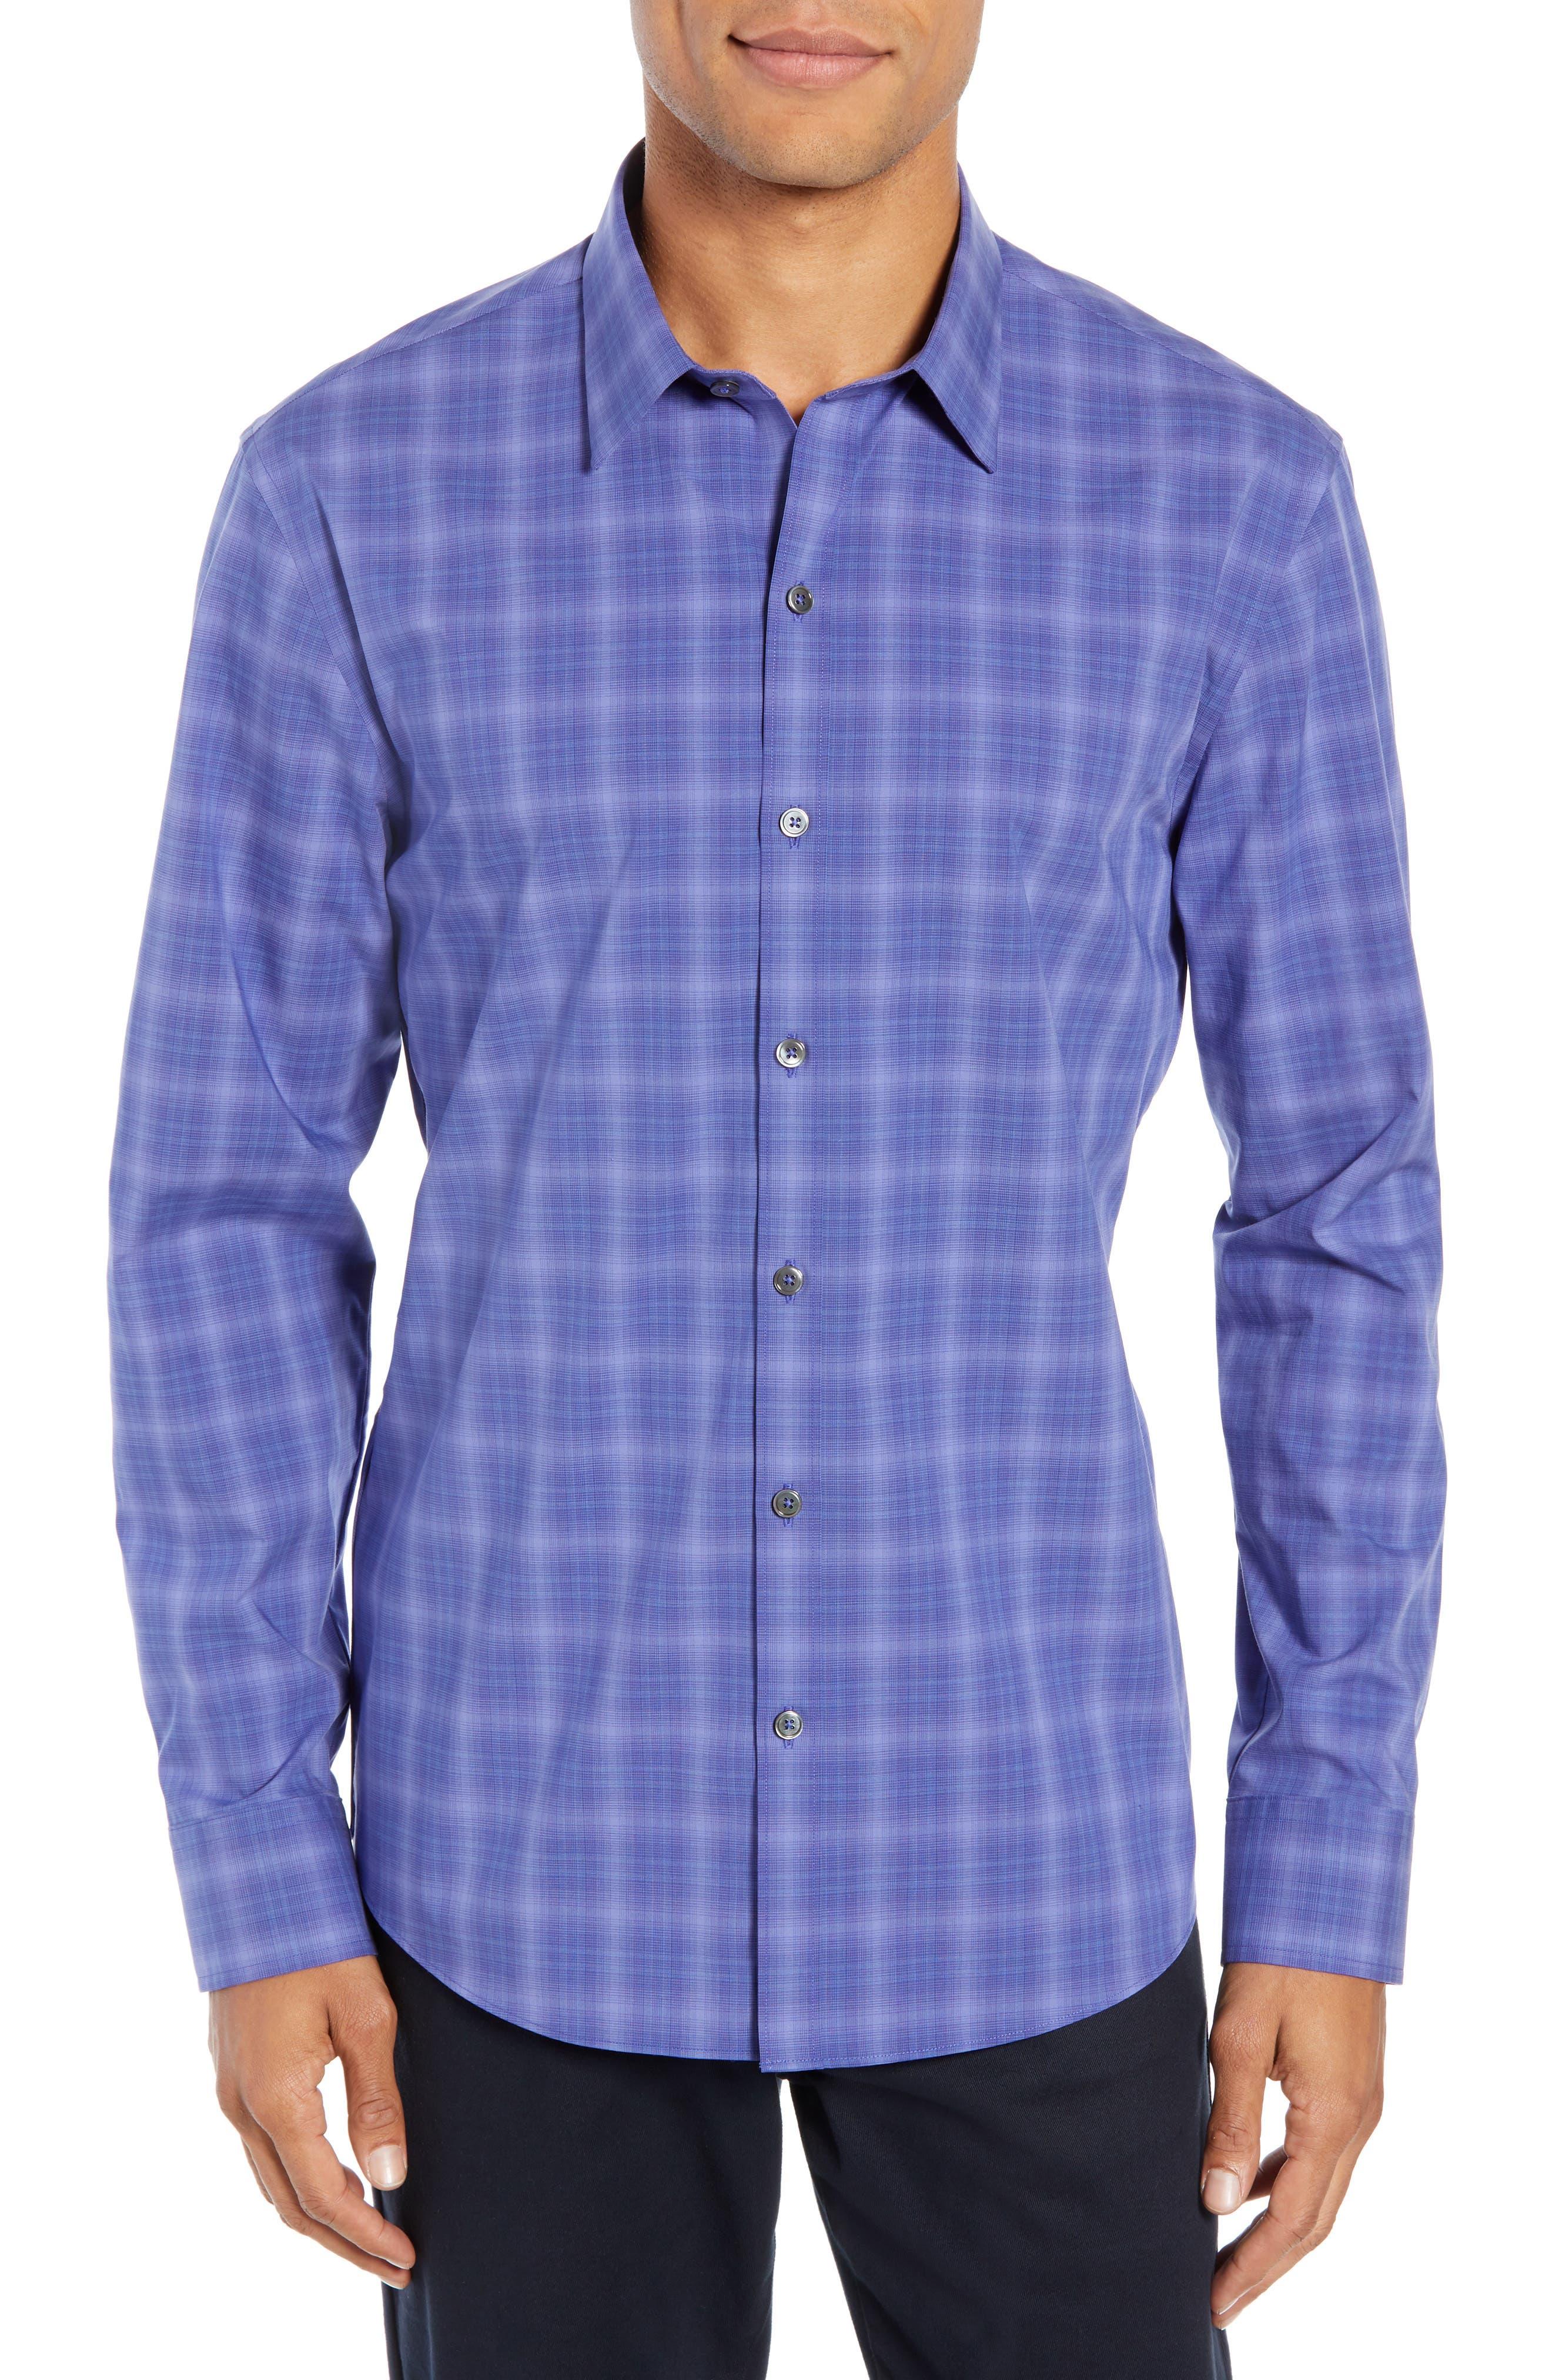 ZACHARY PRELL Wandy Regular Fit Check Sport Shirt, Main, color, LIGHT PURPLE